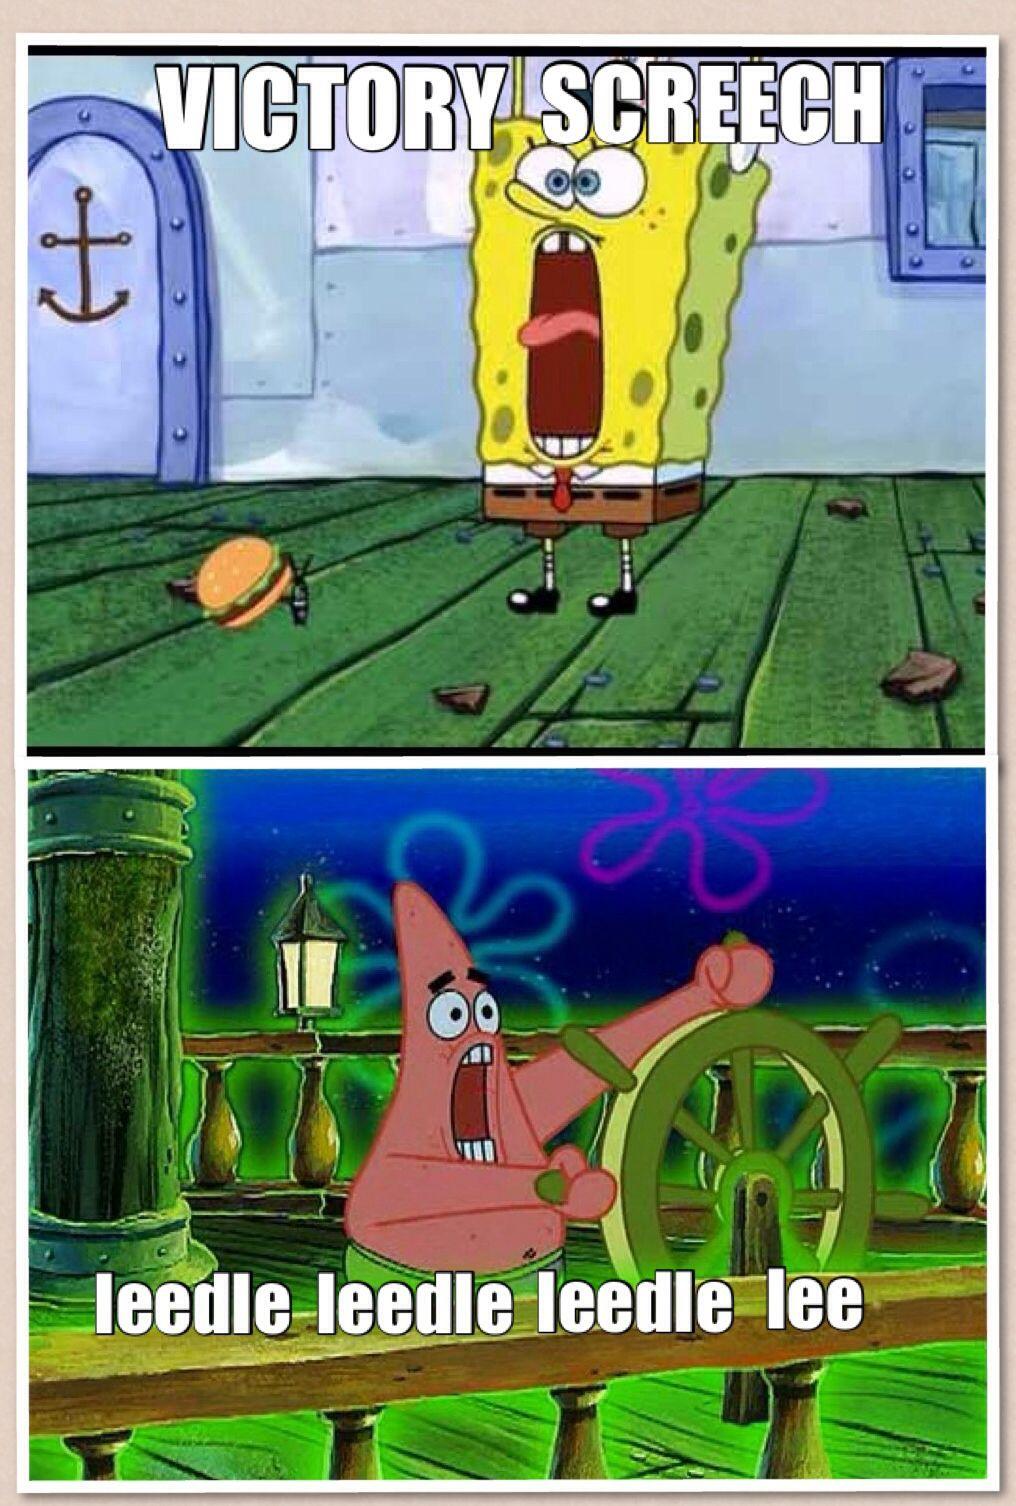 Pin by soph on ᔕᑭoᑎgeᗷoᗷ pinterest spongebob spongebob